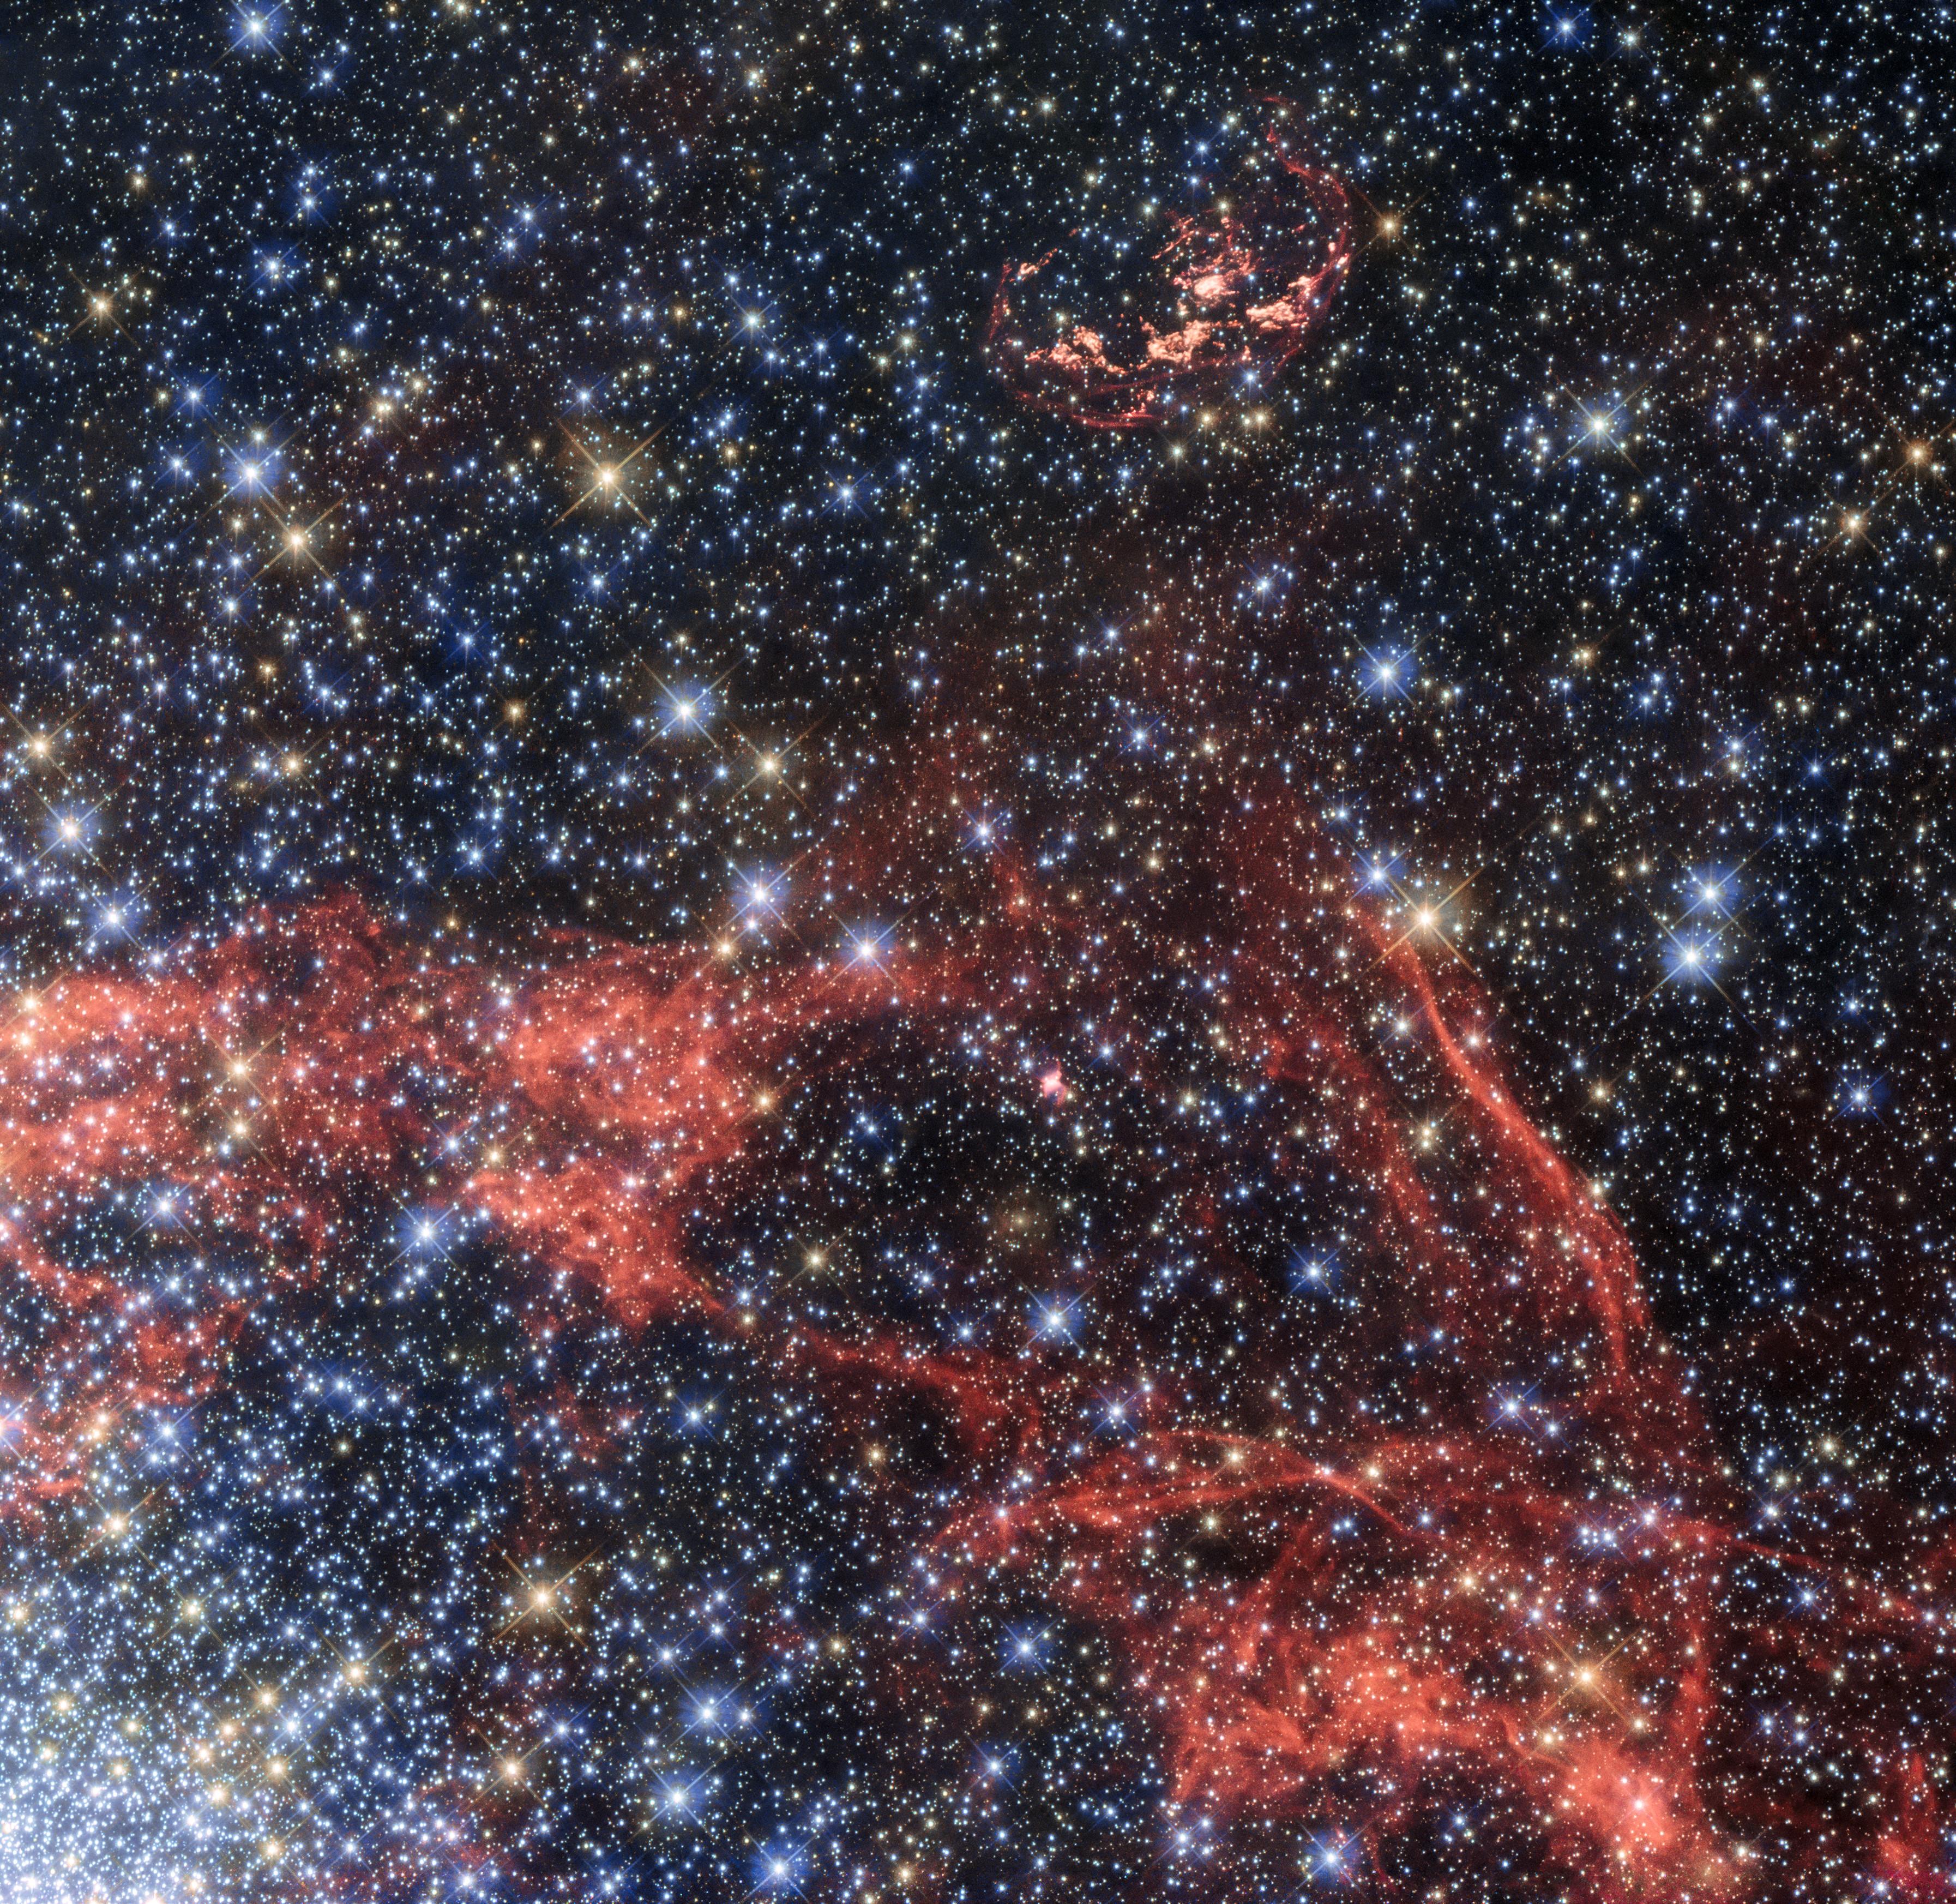 Supernova remnant N103B | ESA/Hubble